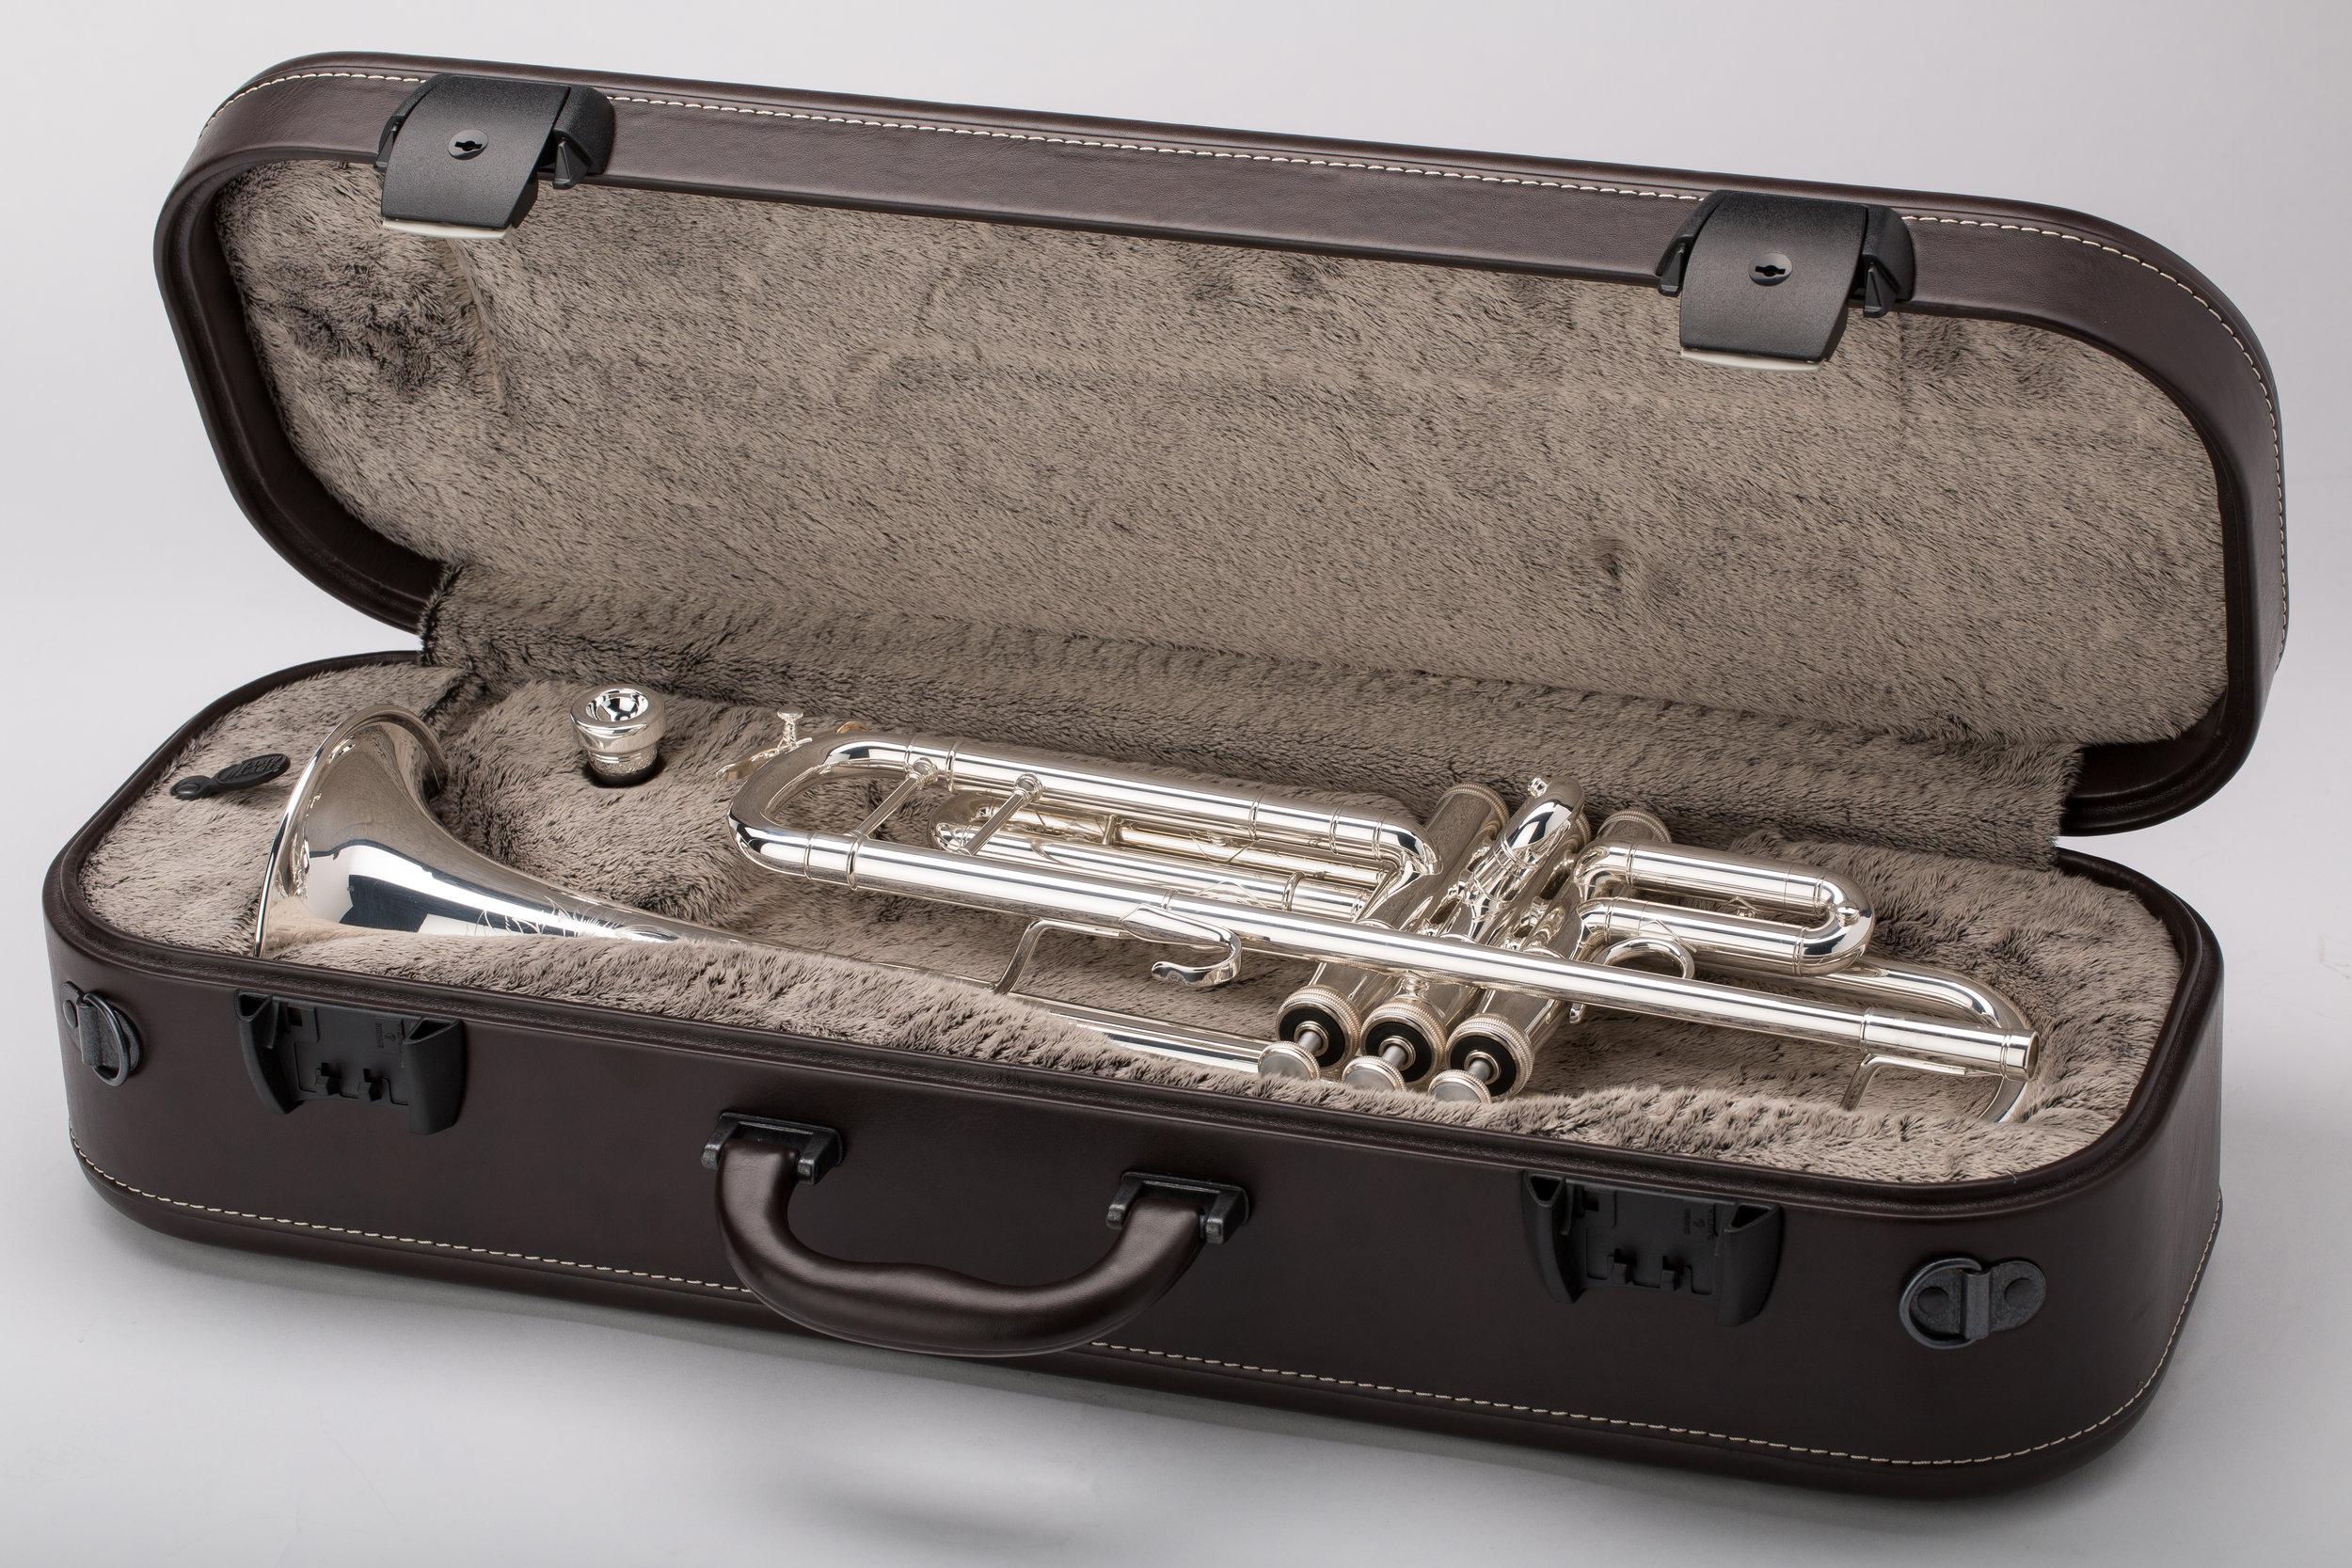 Shires_Case_Trumpet_Open2_0317.jpg